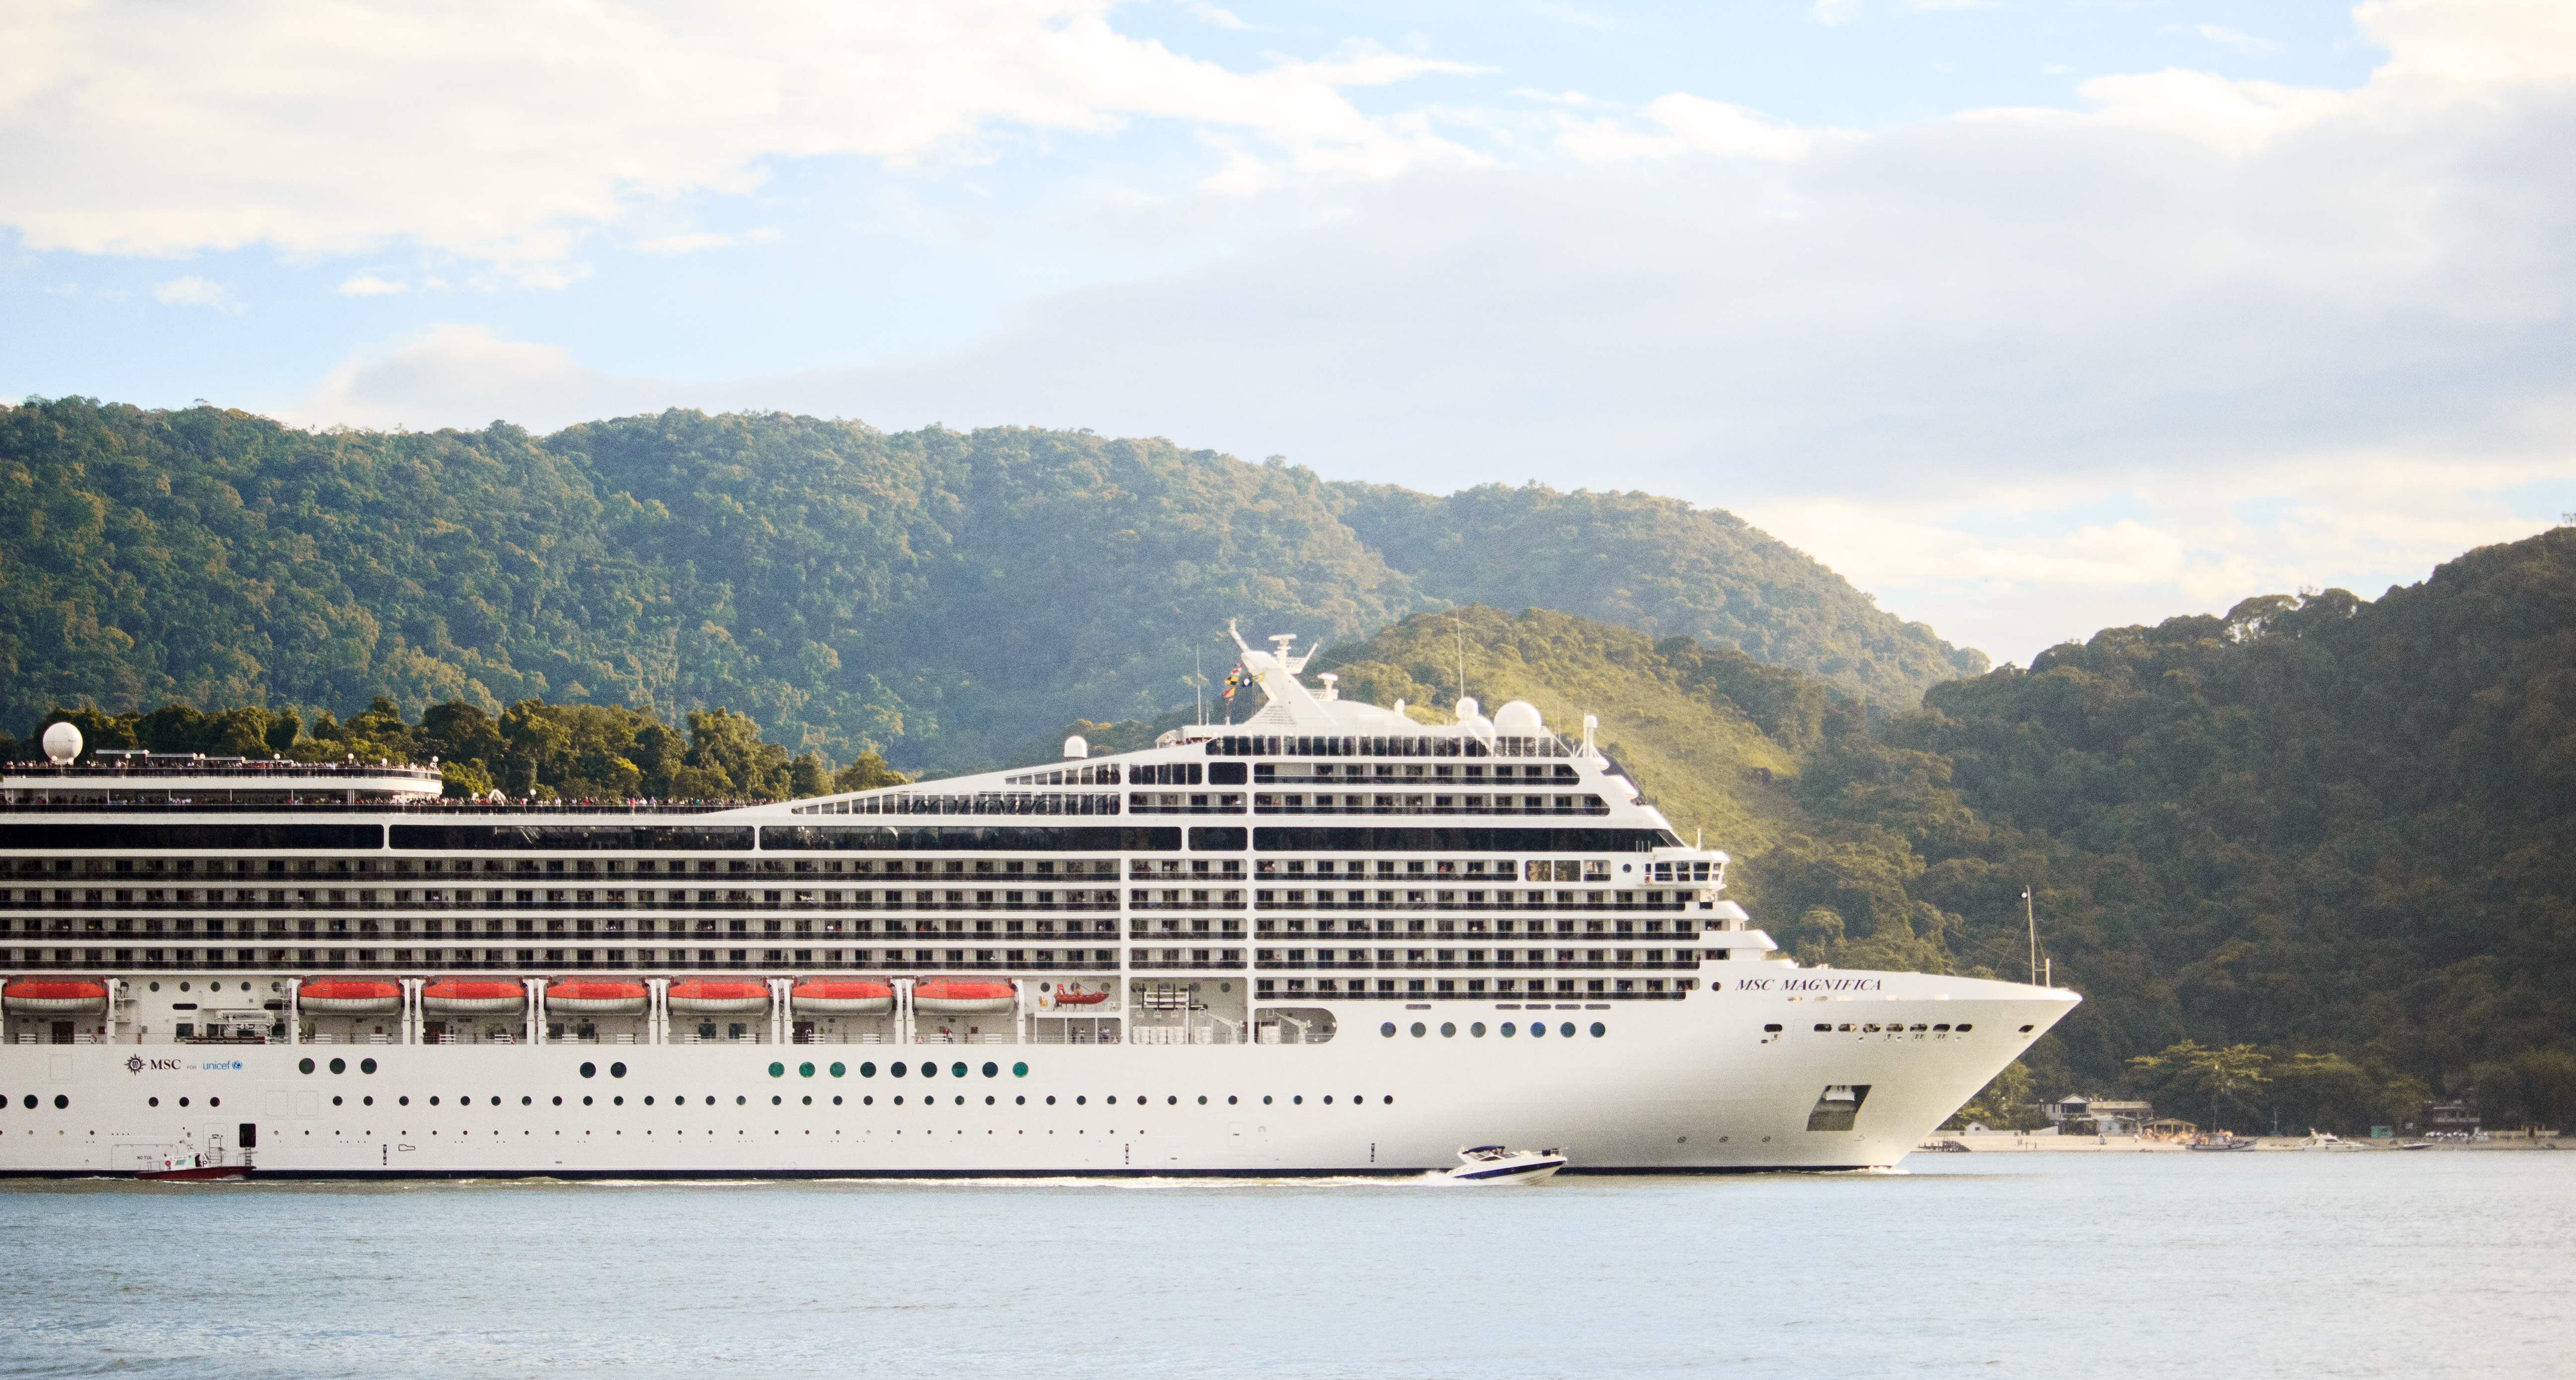 Can a cruise ship feel the impacts of tsunamis, earthquakes?